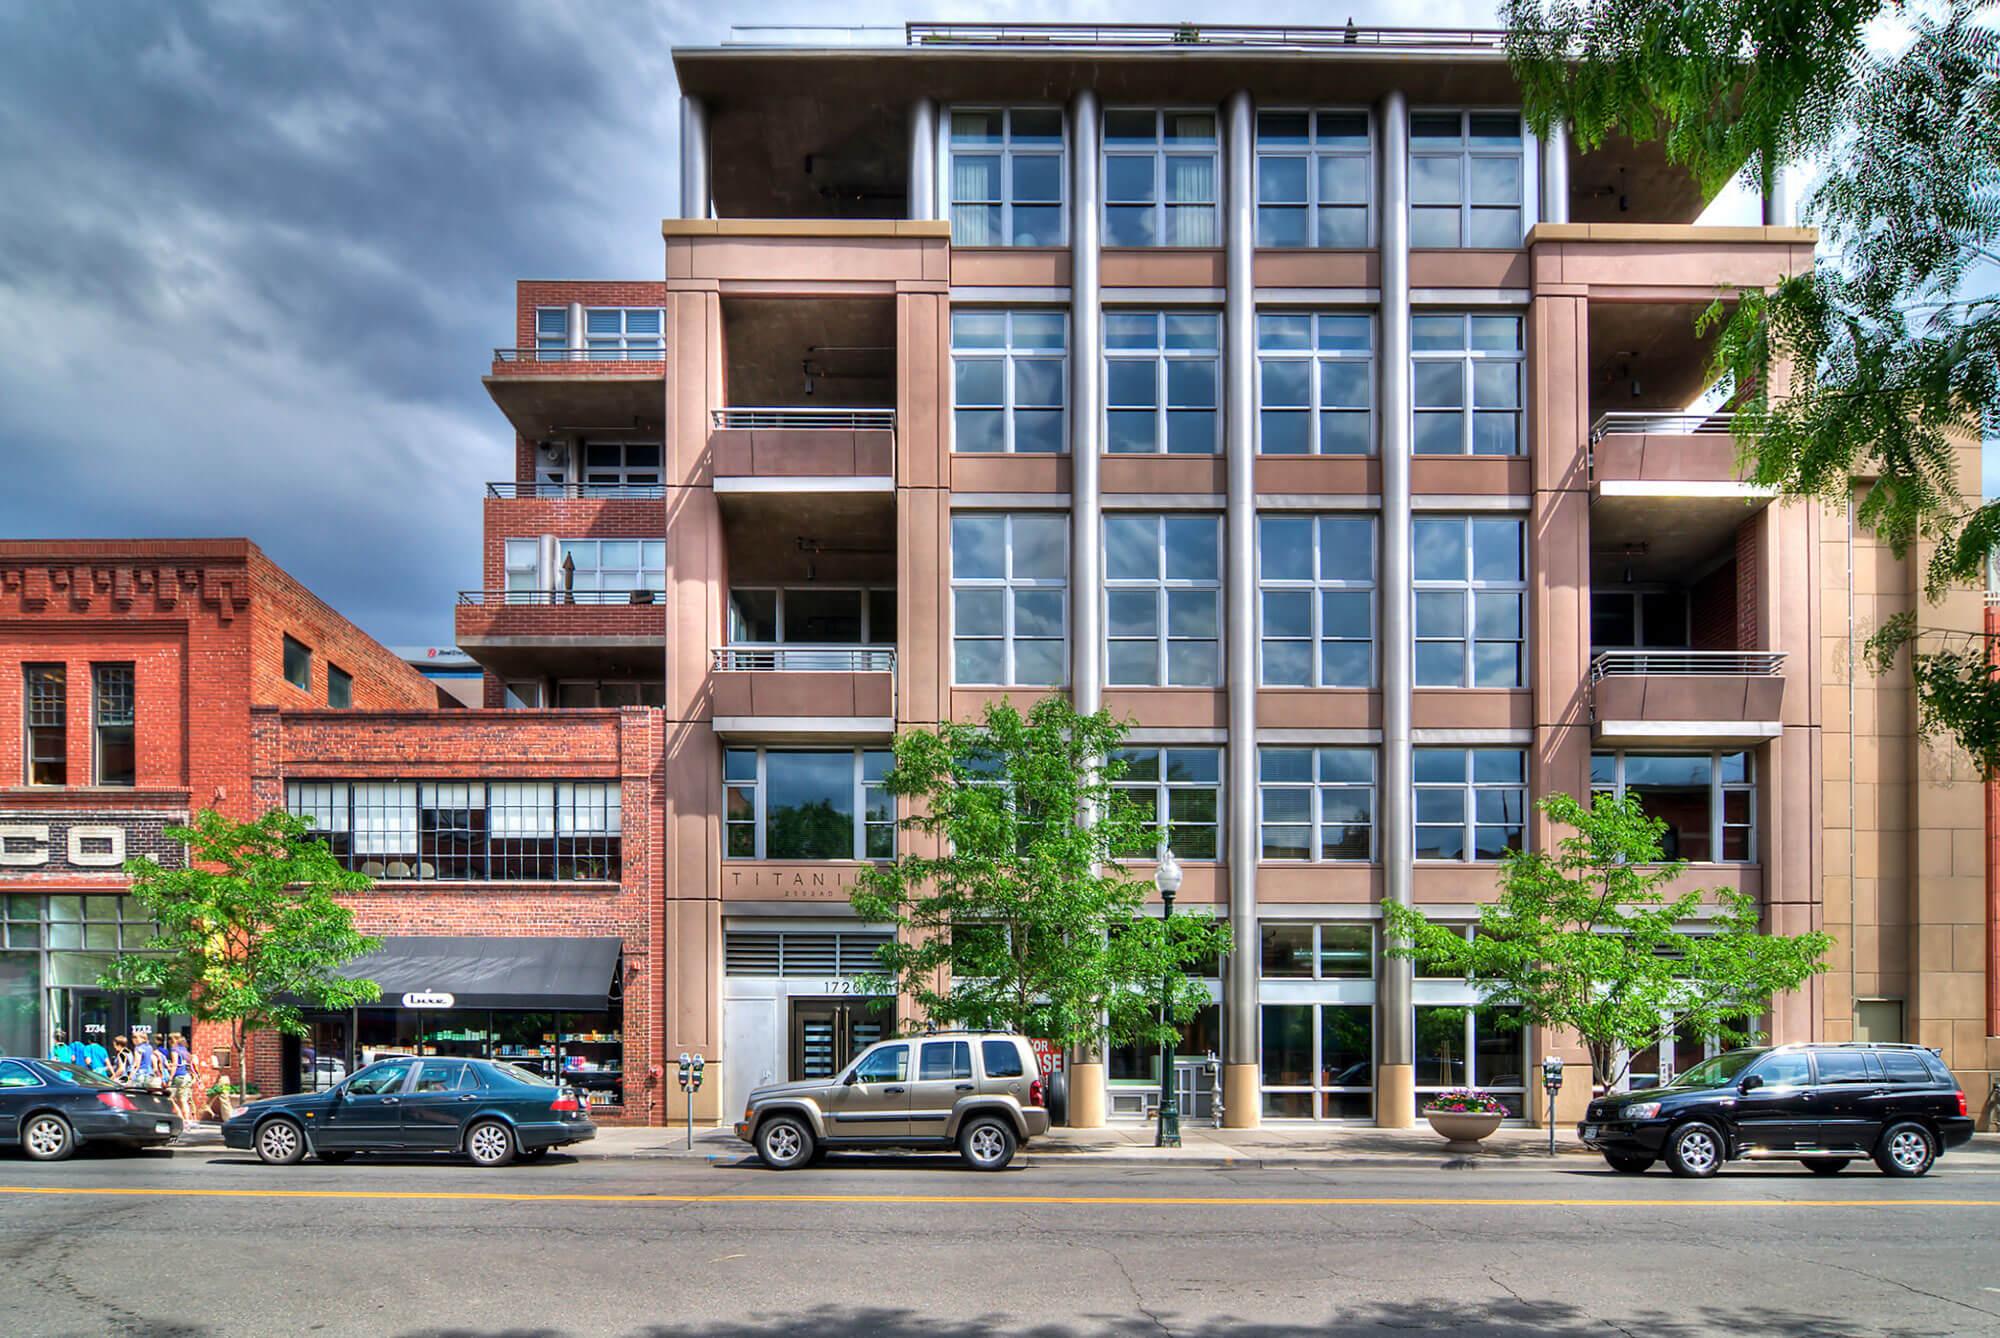 Downtown Denver loft for sale at Titanium Lofts in Lodo